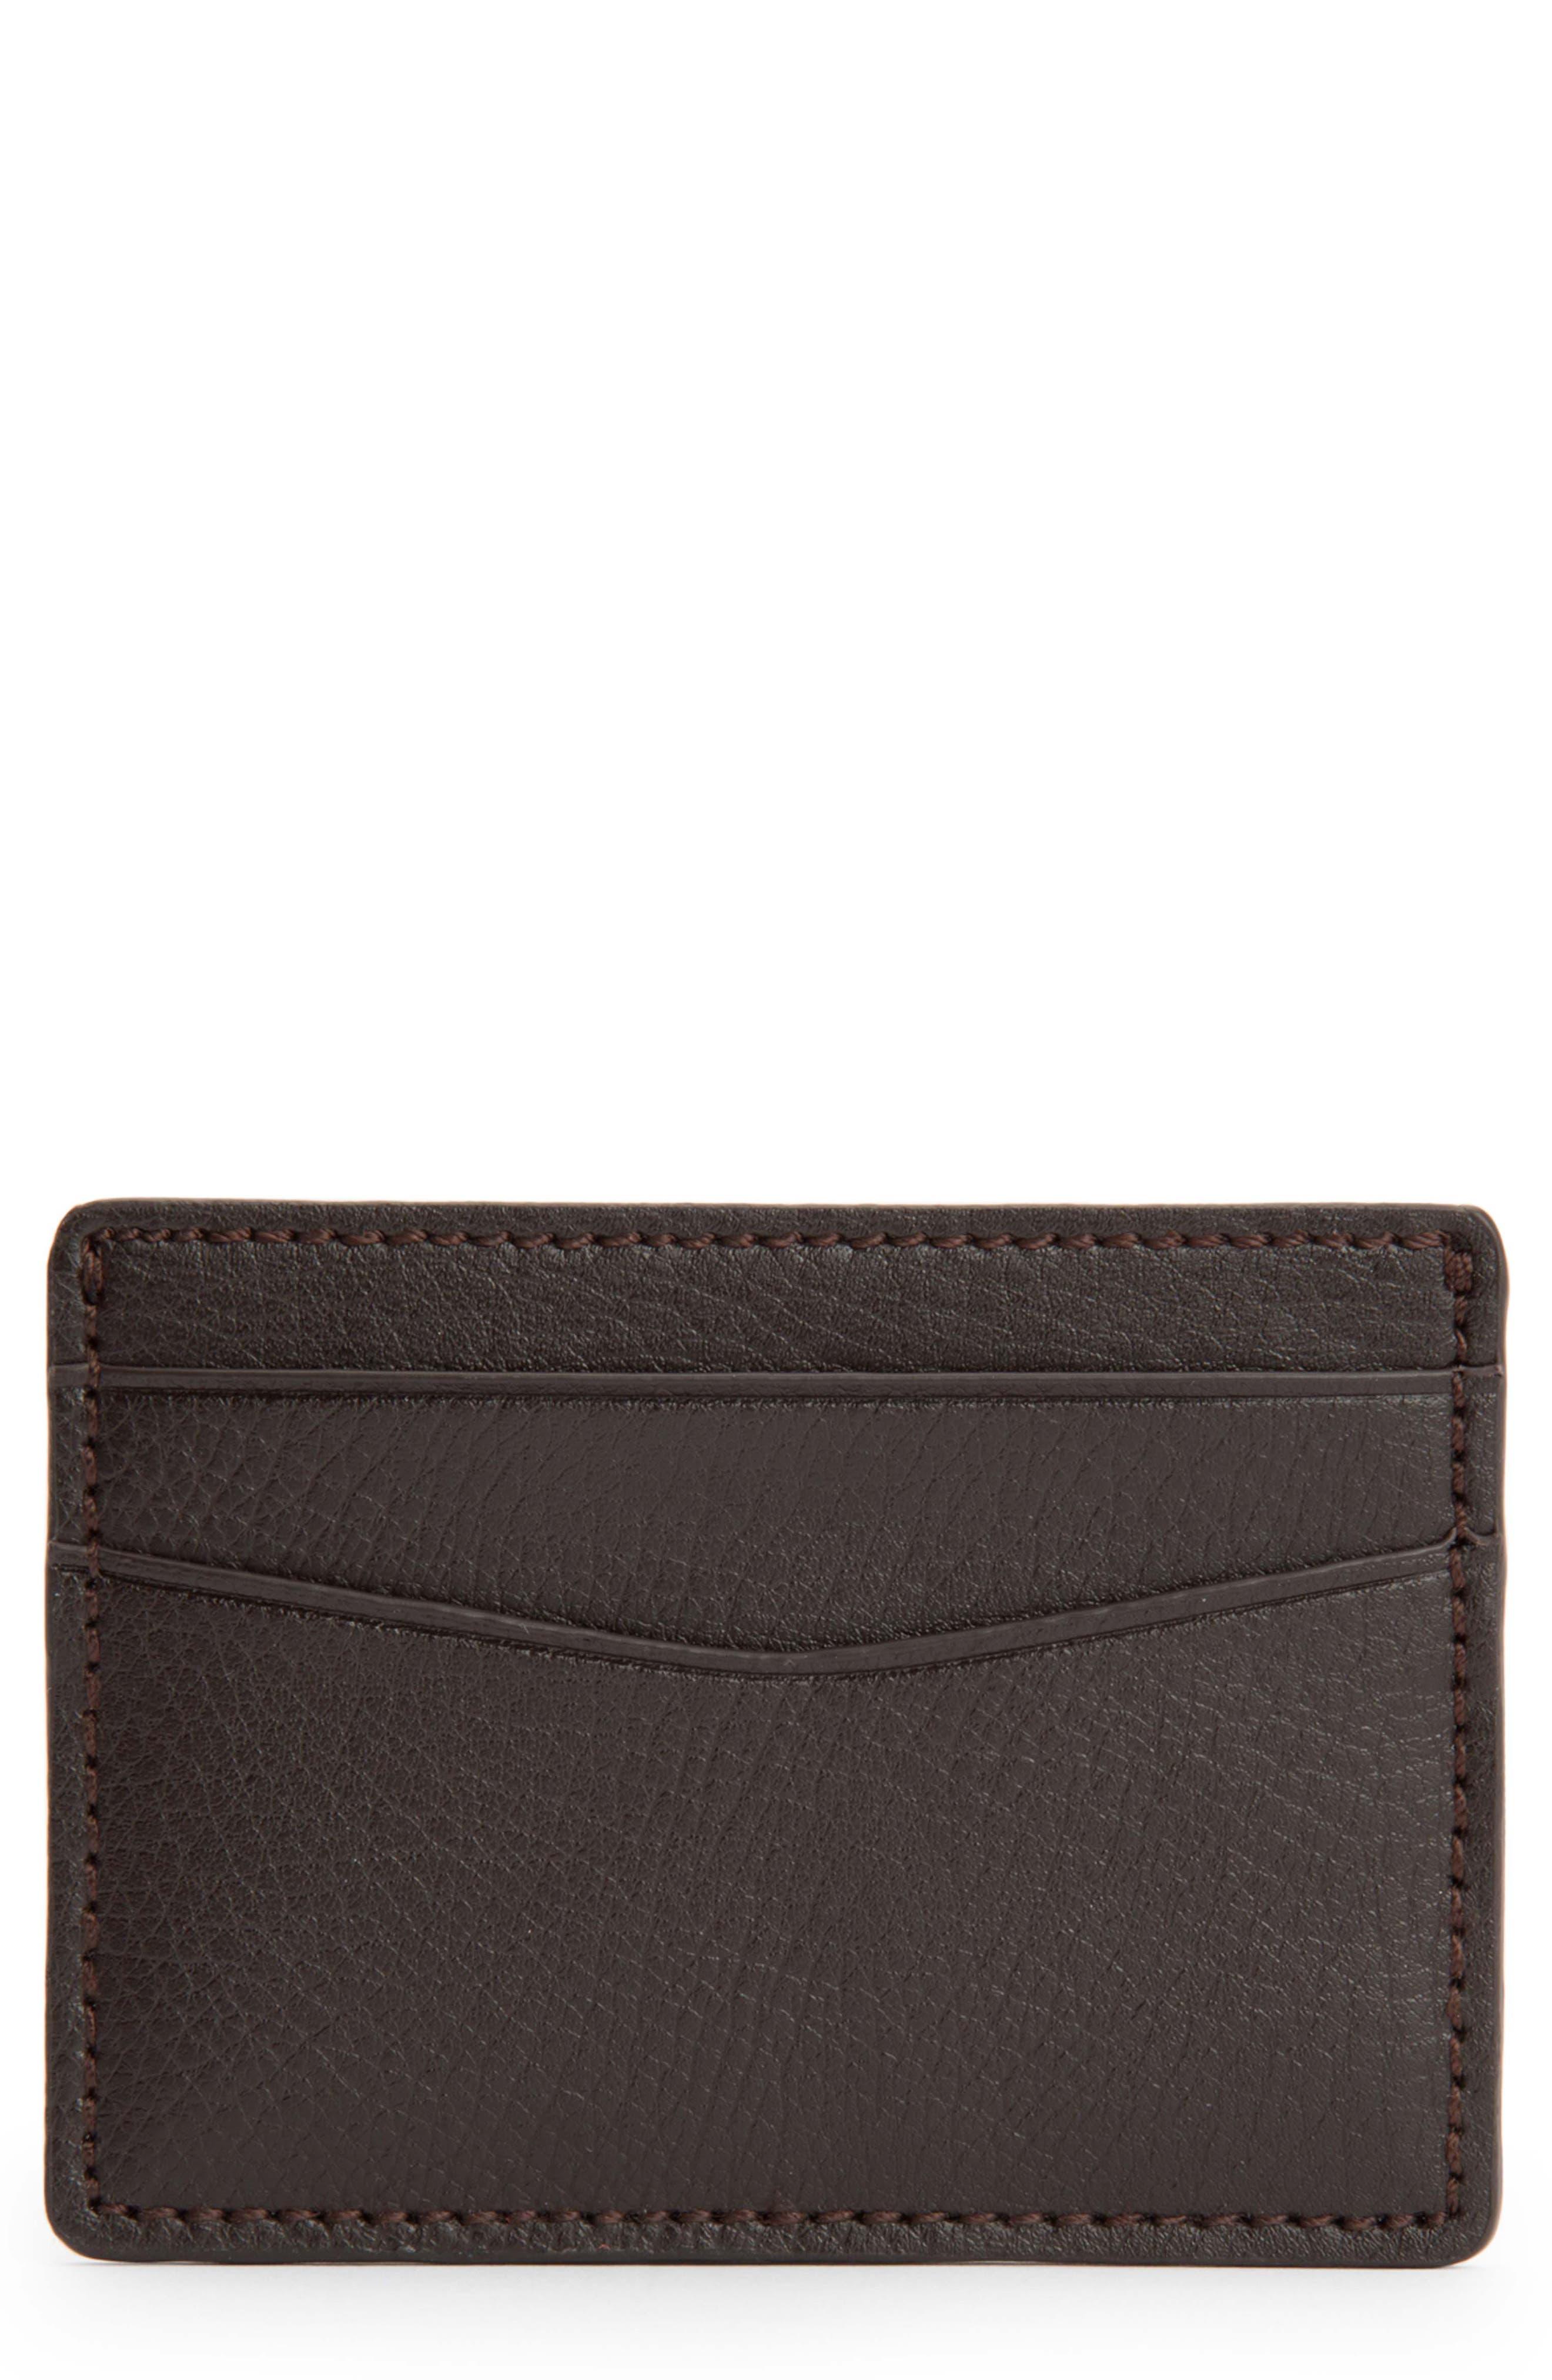 Blake Card Case,                         Main,                         color, BROWN